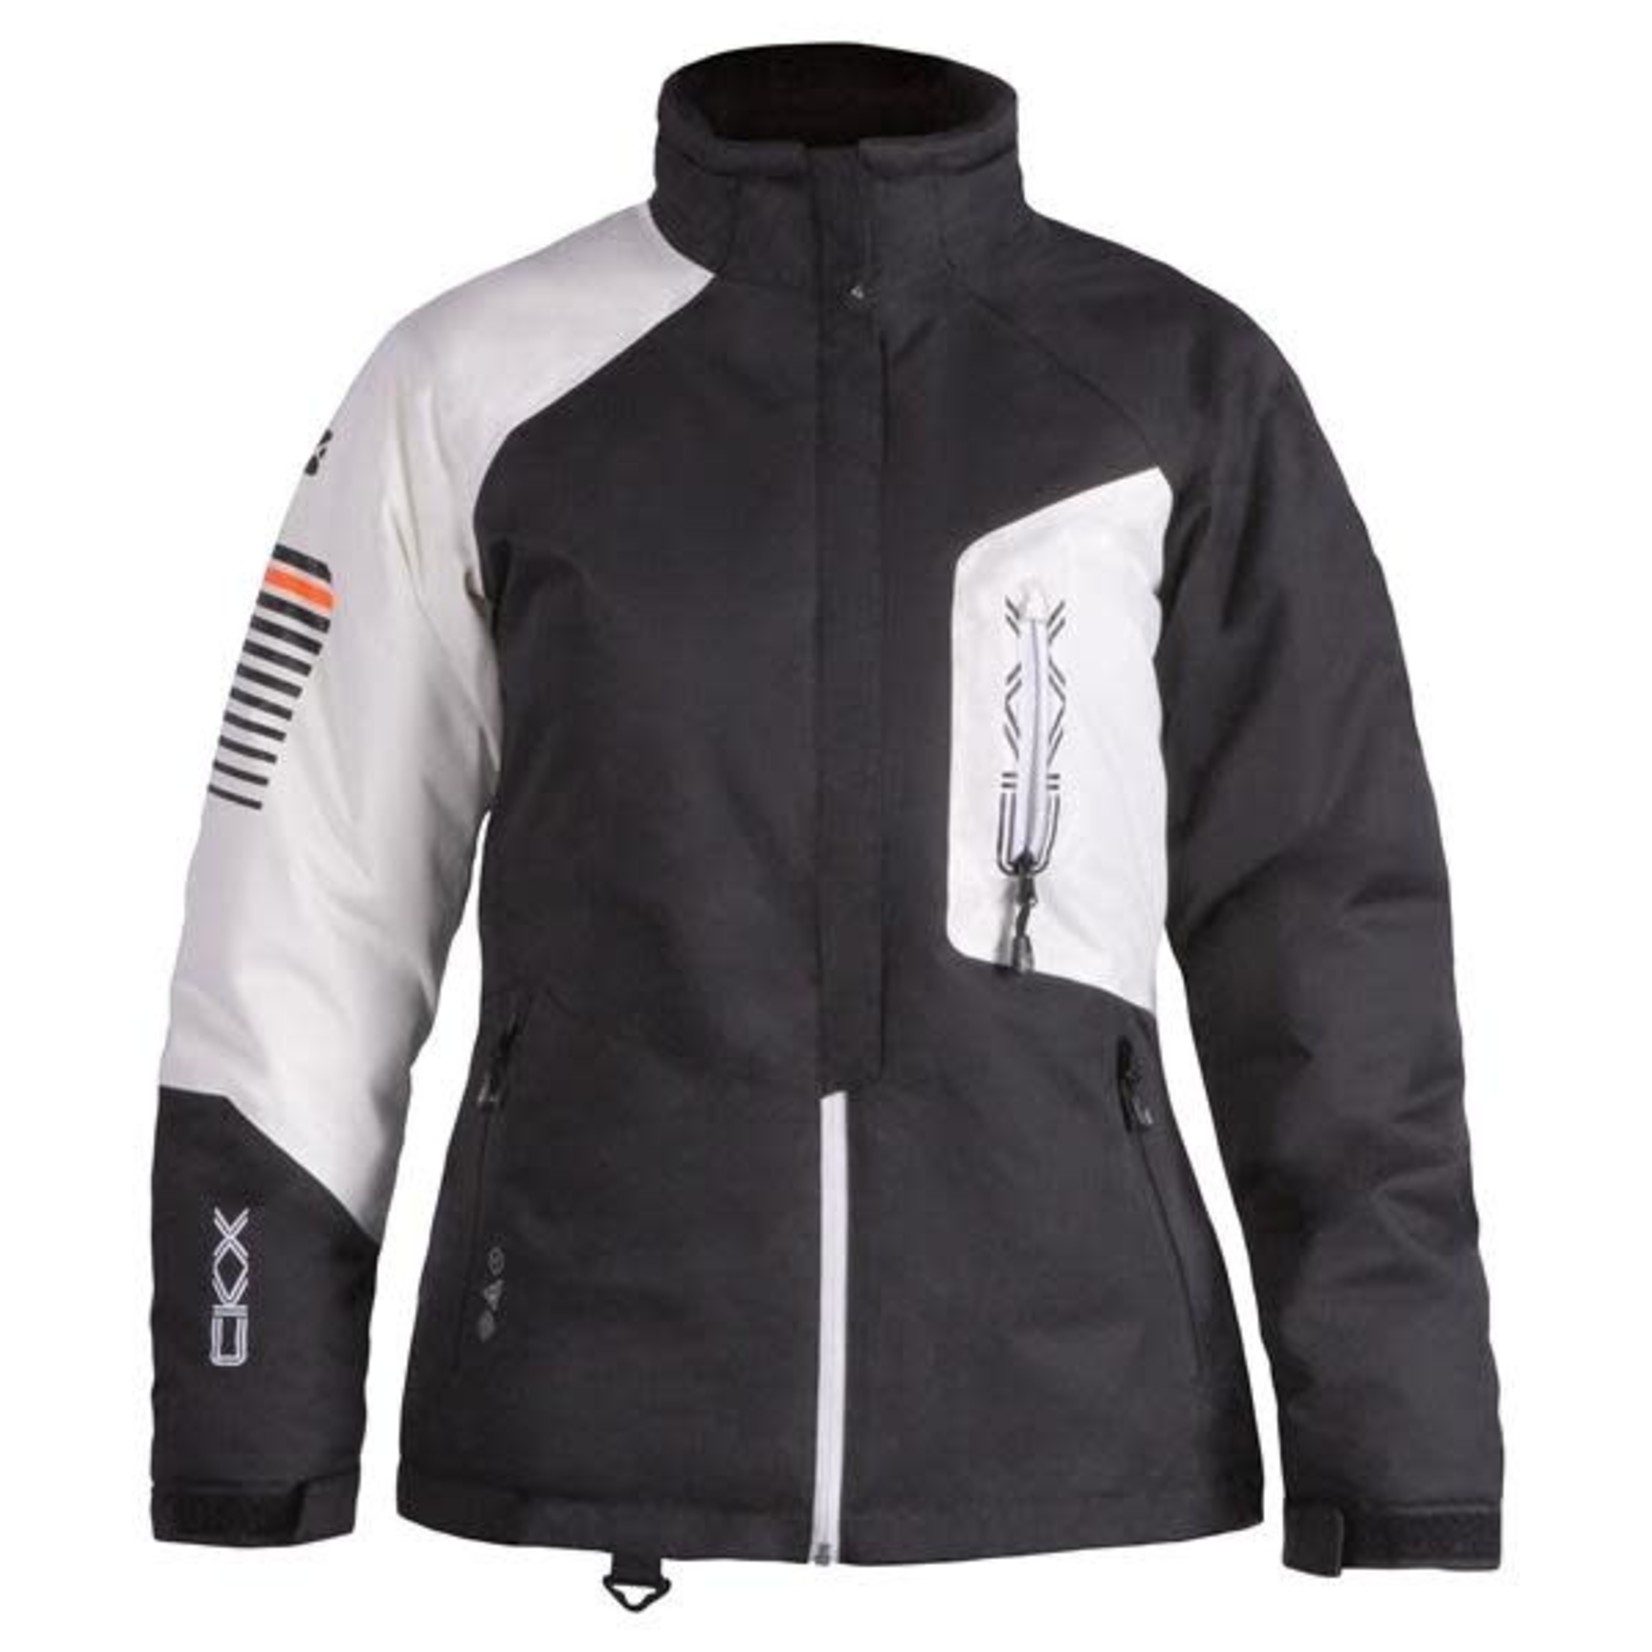 CKX CKX Cozy Women's Jacket